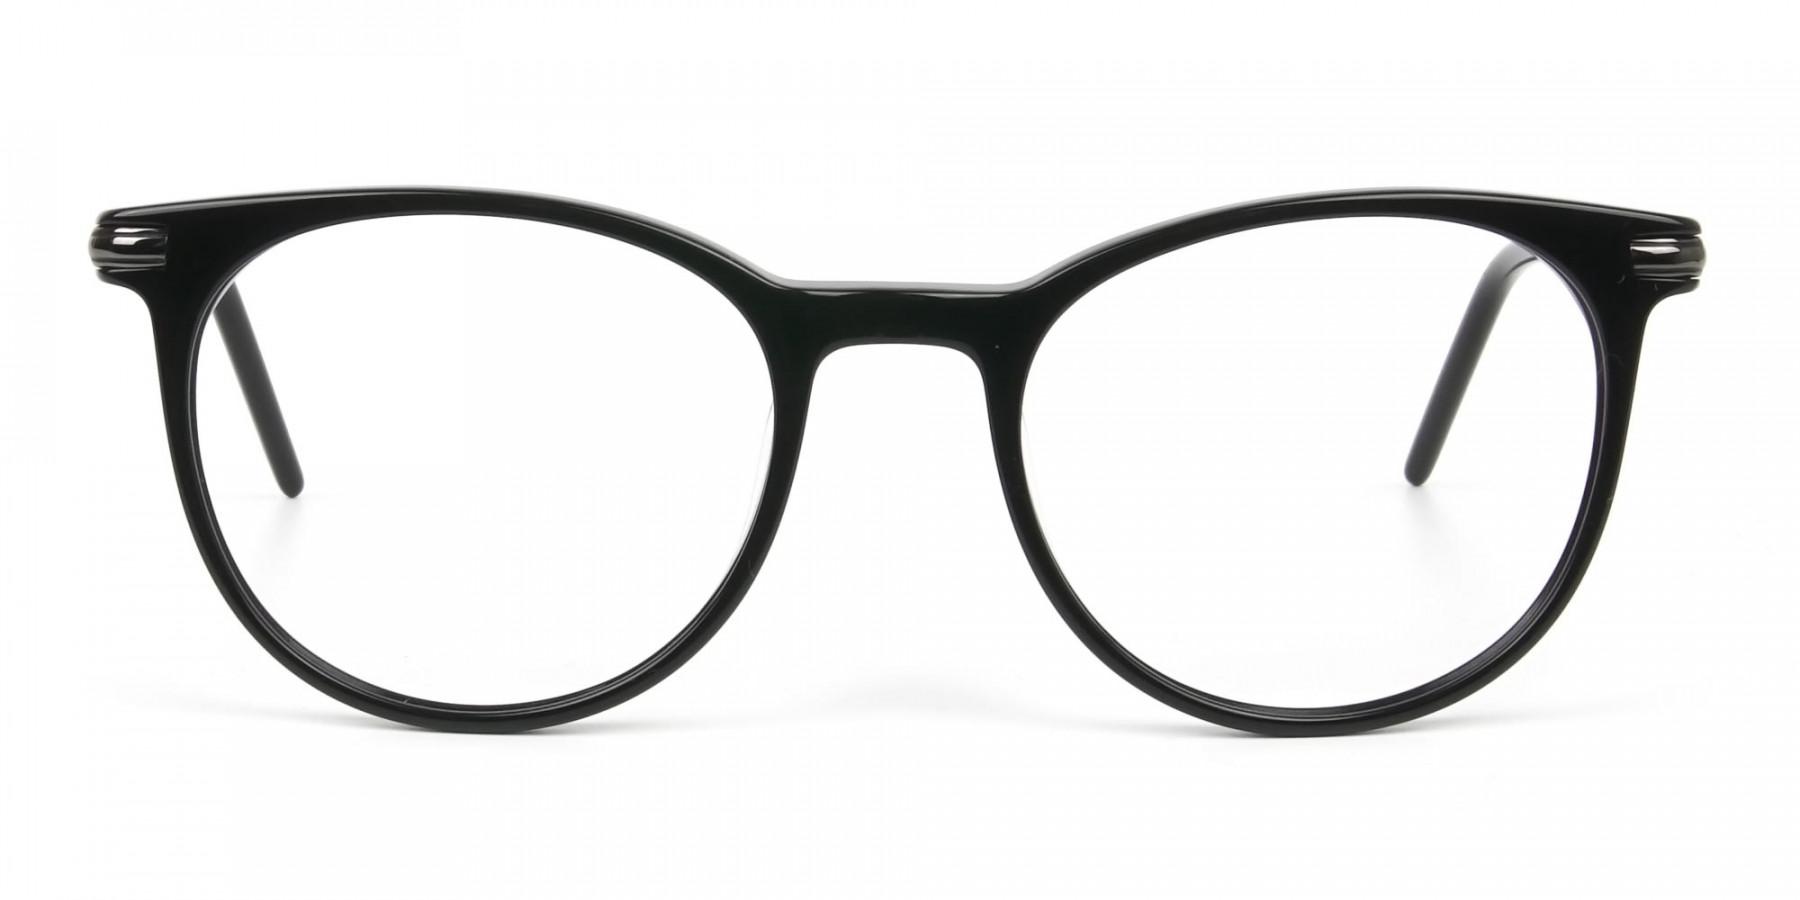 Black Round Spectacles in Acetate - 1